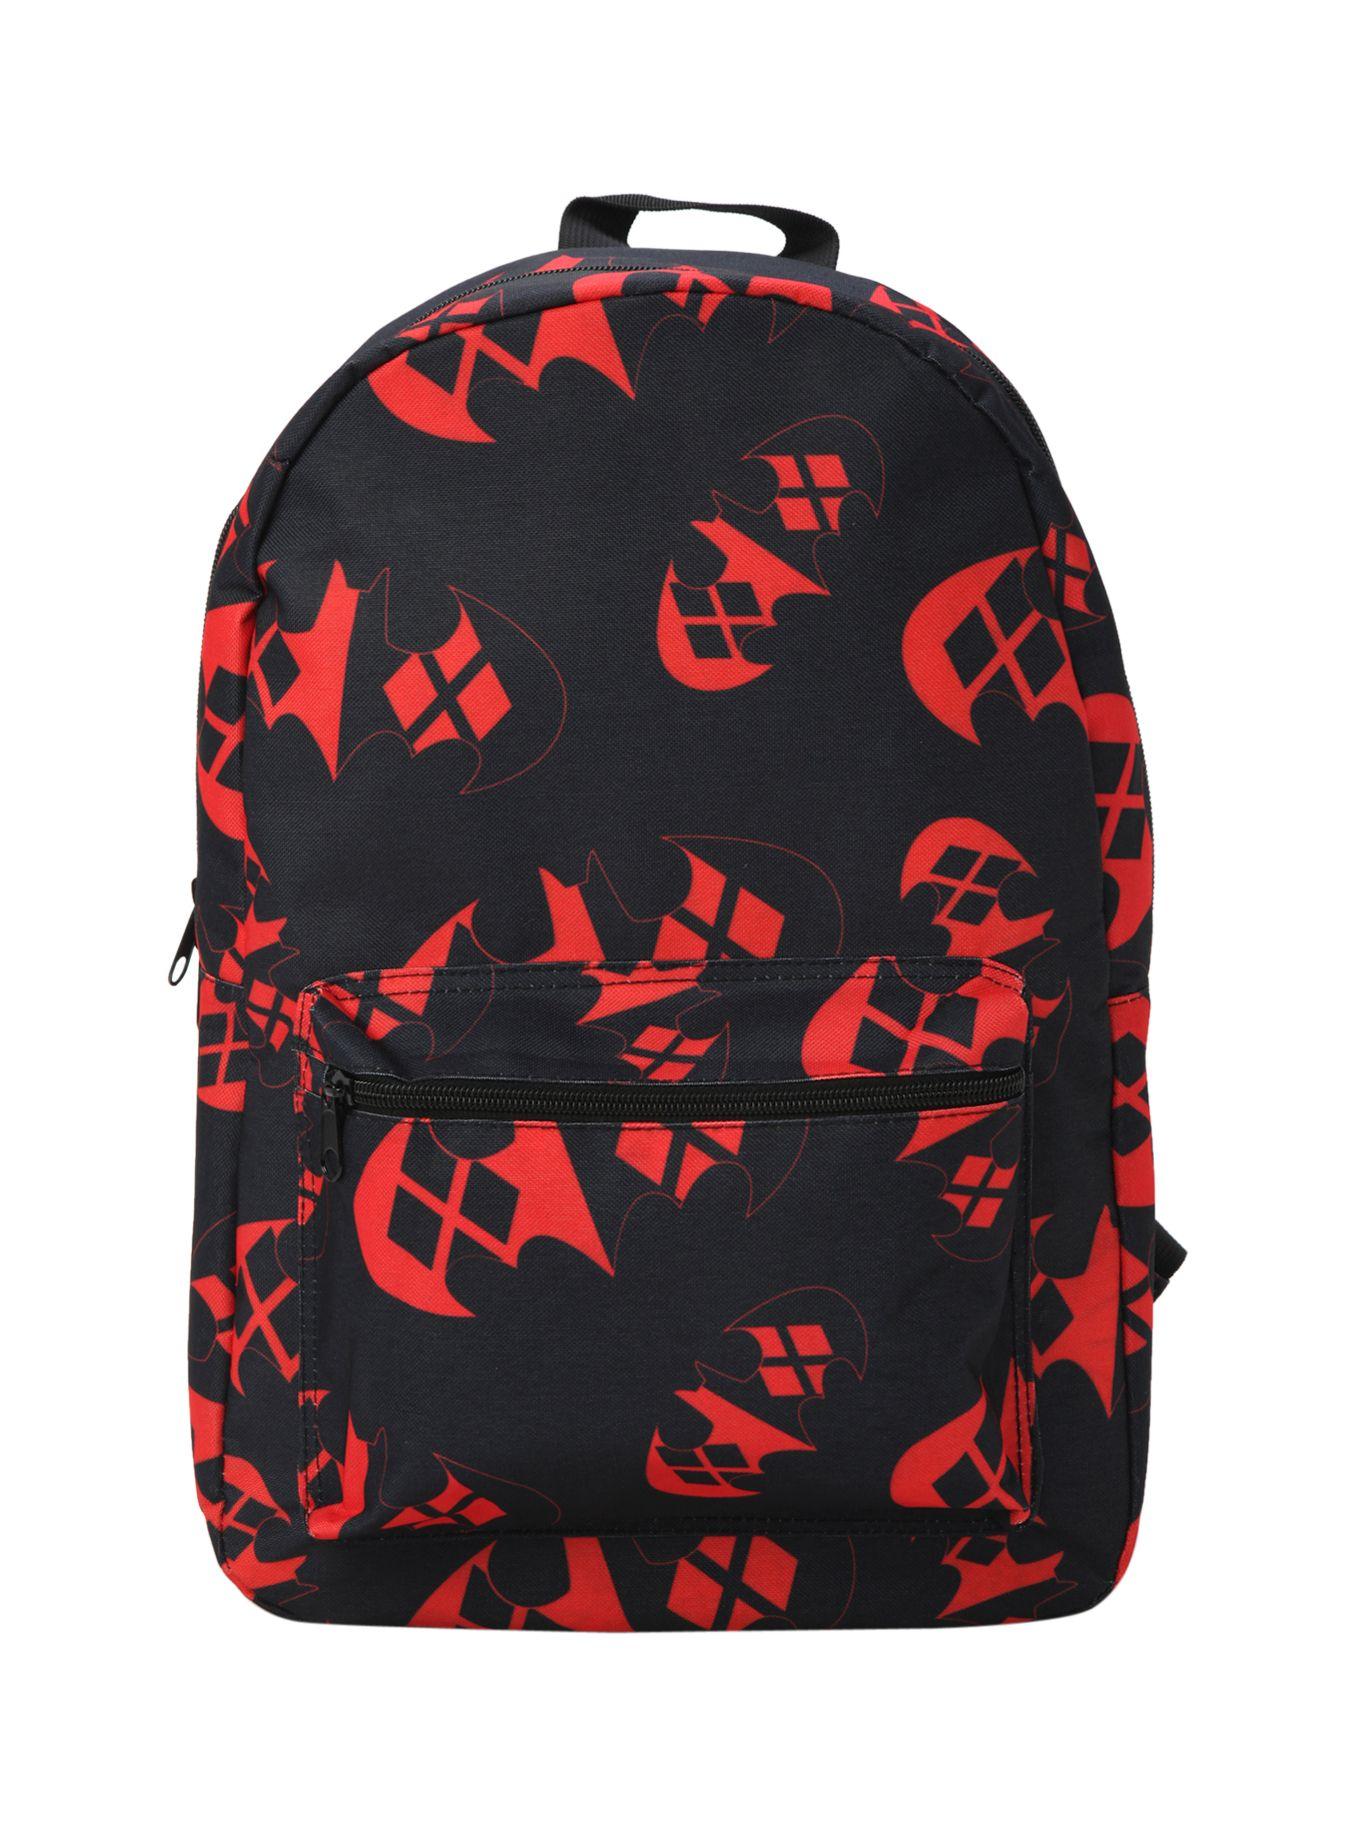 dc ics harley quinn batman logo backpack hot topic harley